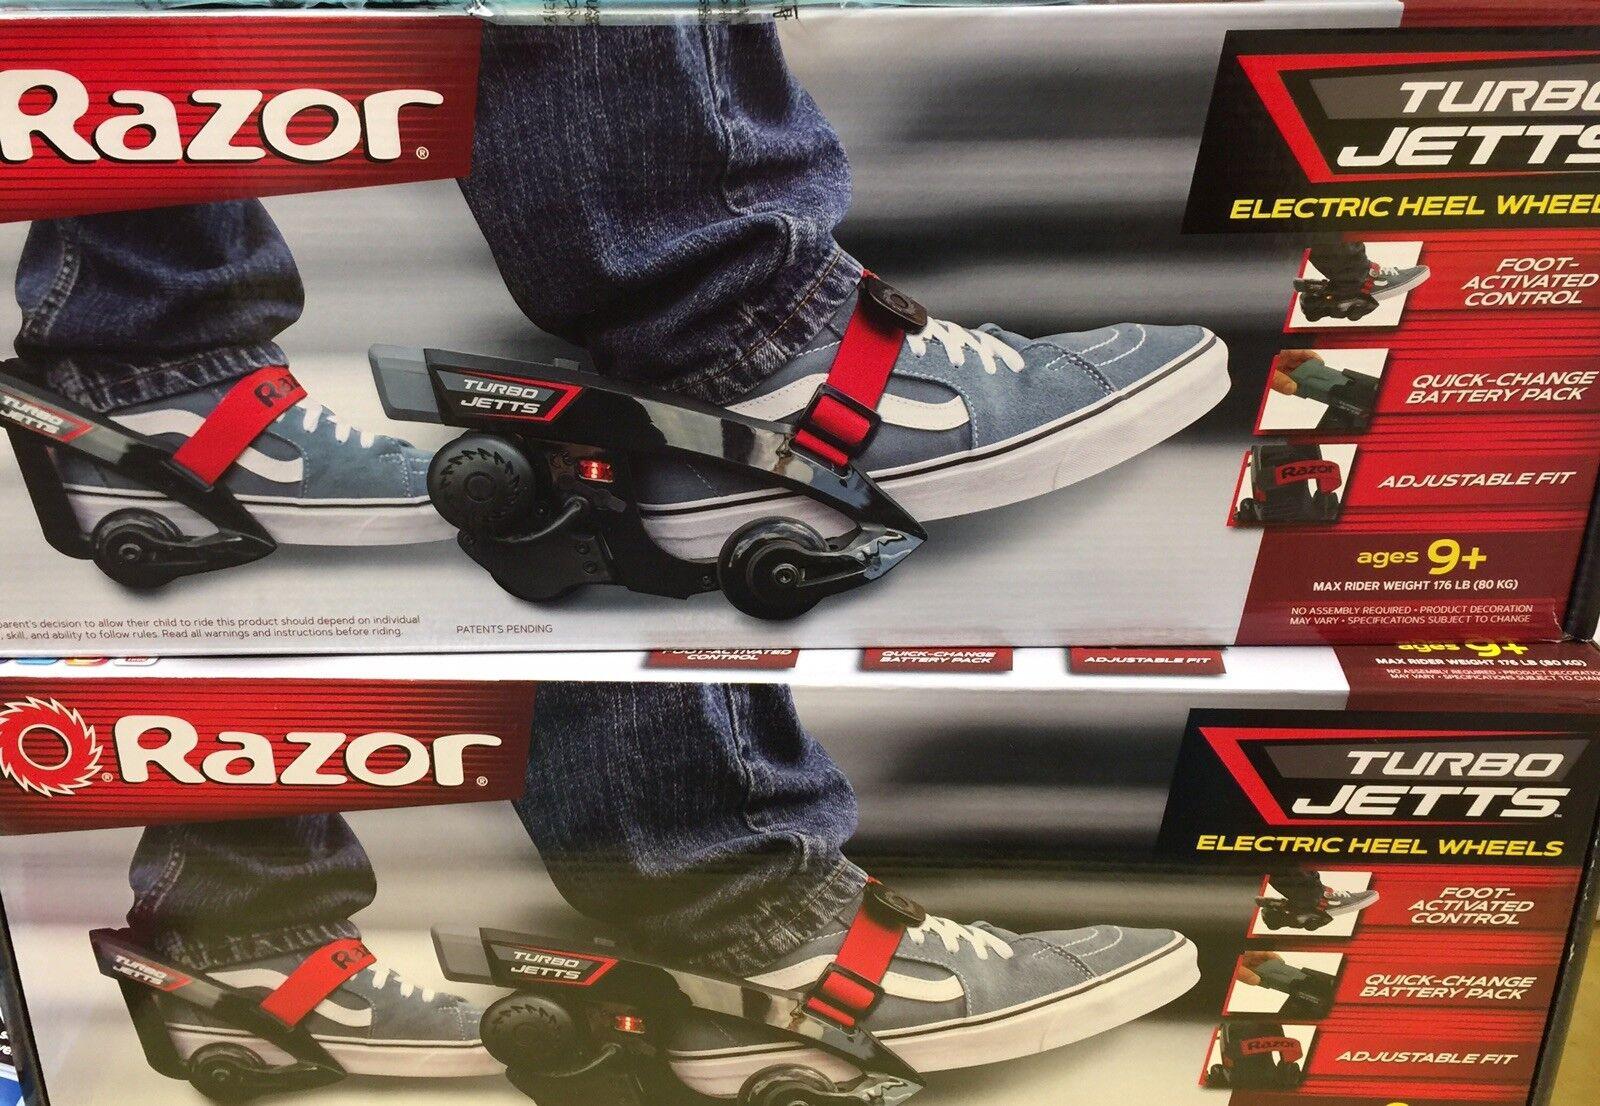 Razor Turbo Jett's Electric Heel Wheels